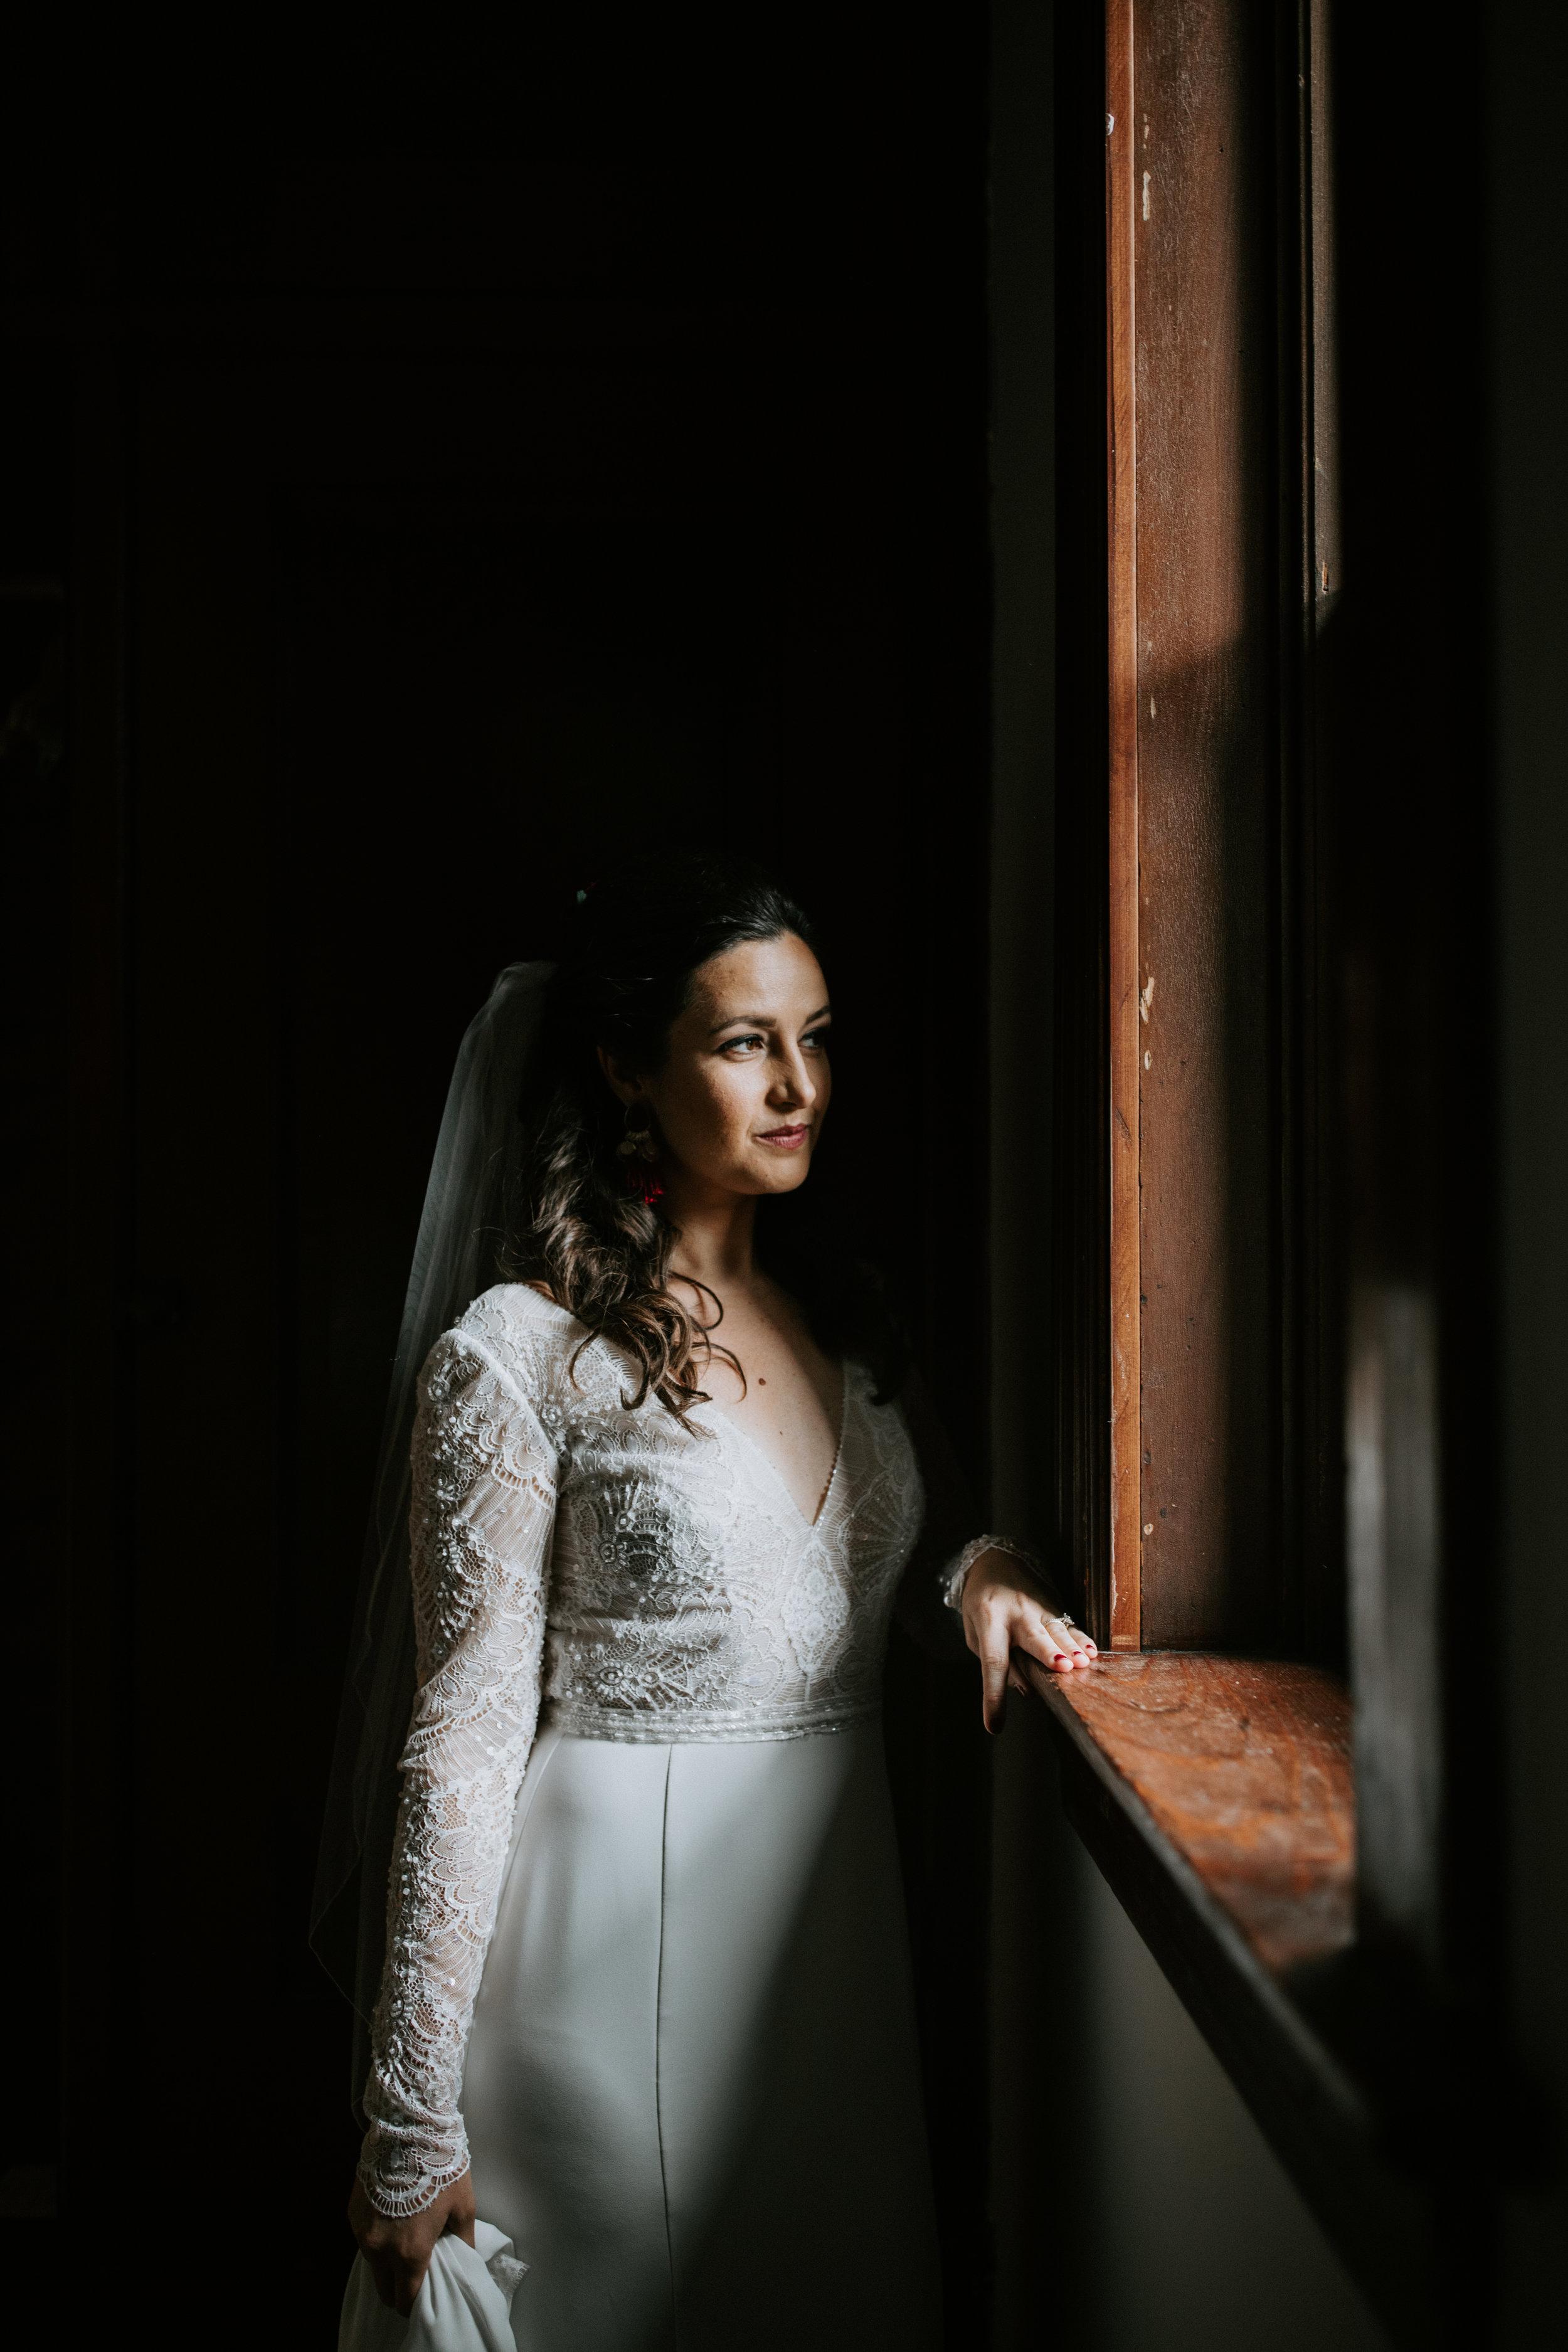 st-louis-missouri-wedding-photographer-tower-grove-park-sheldon-concert-hall-steph+phil-229.jpg